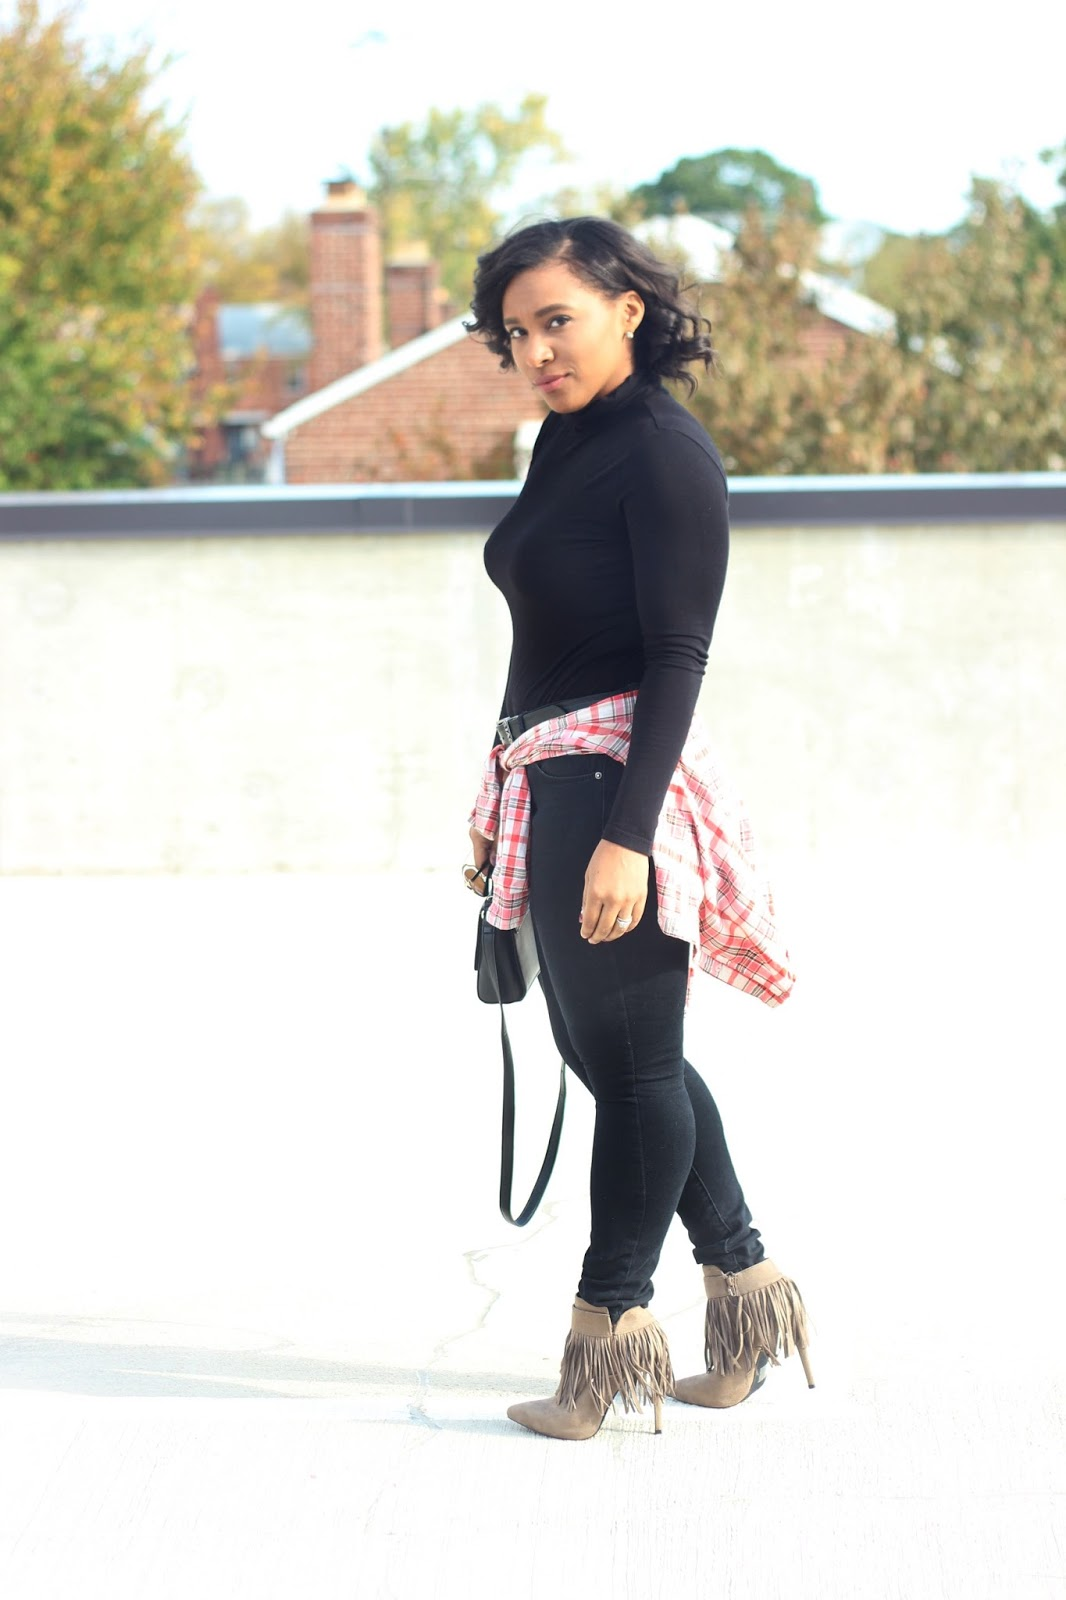 plaid, fringe, black outfits, fall outfits, sunglasses